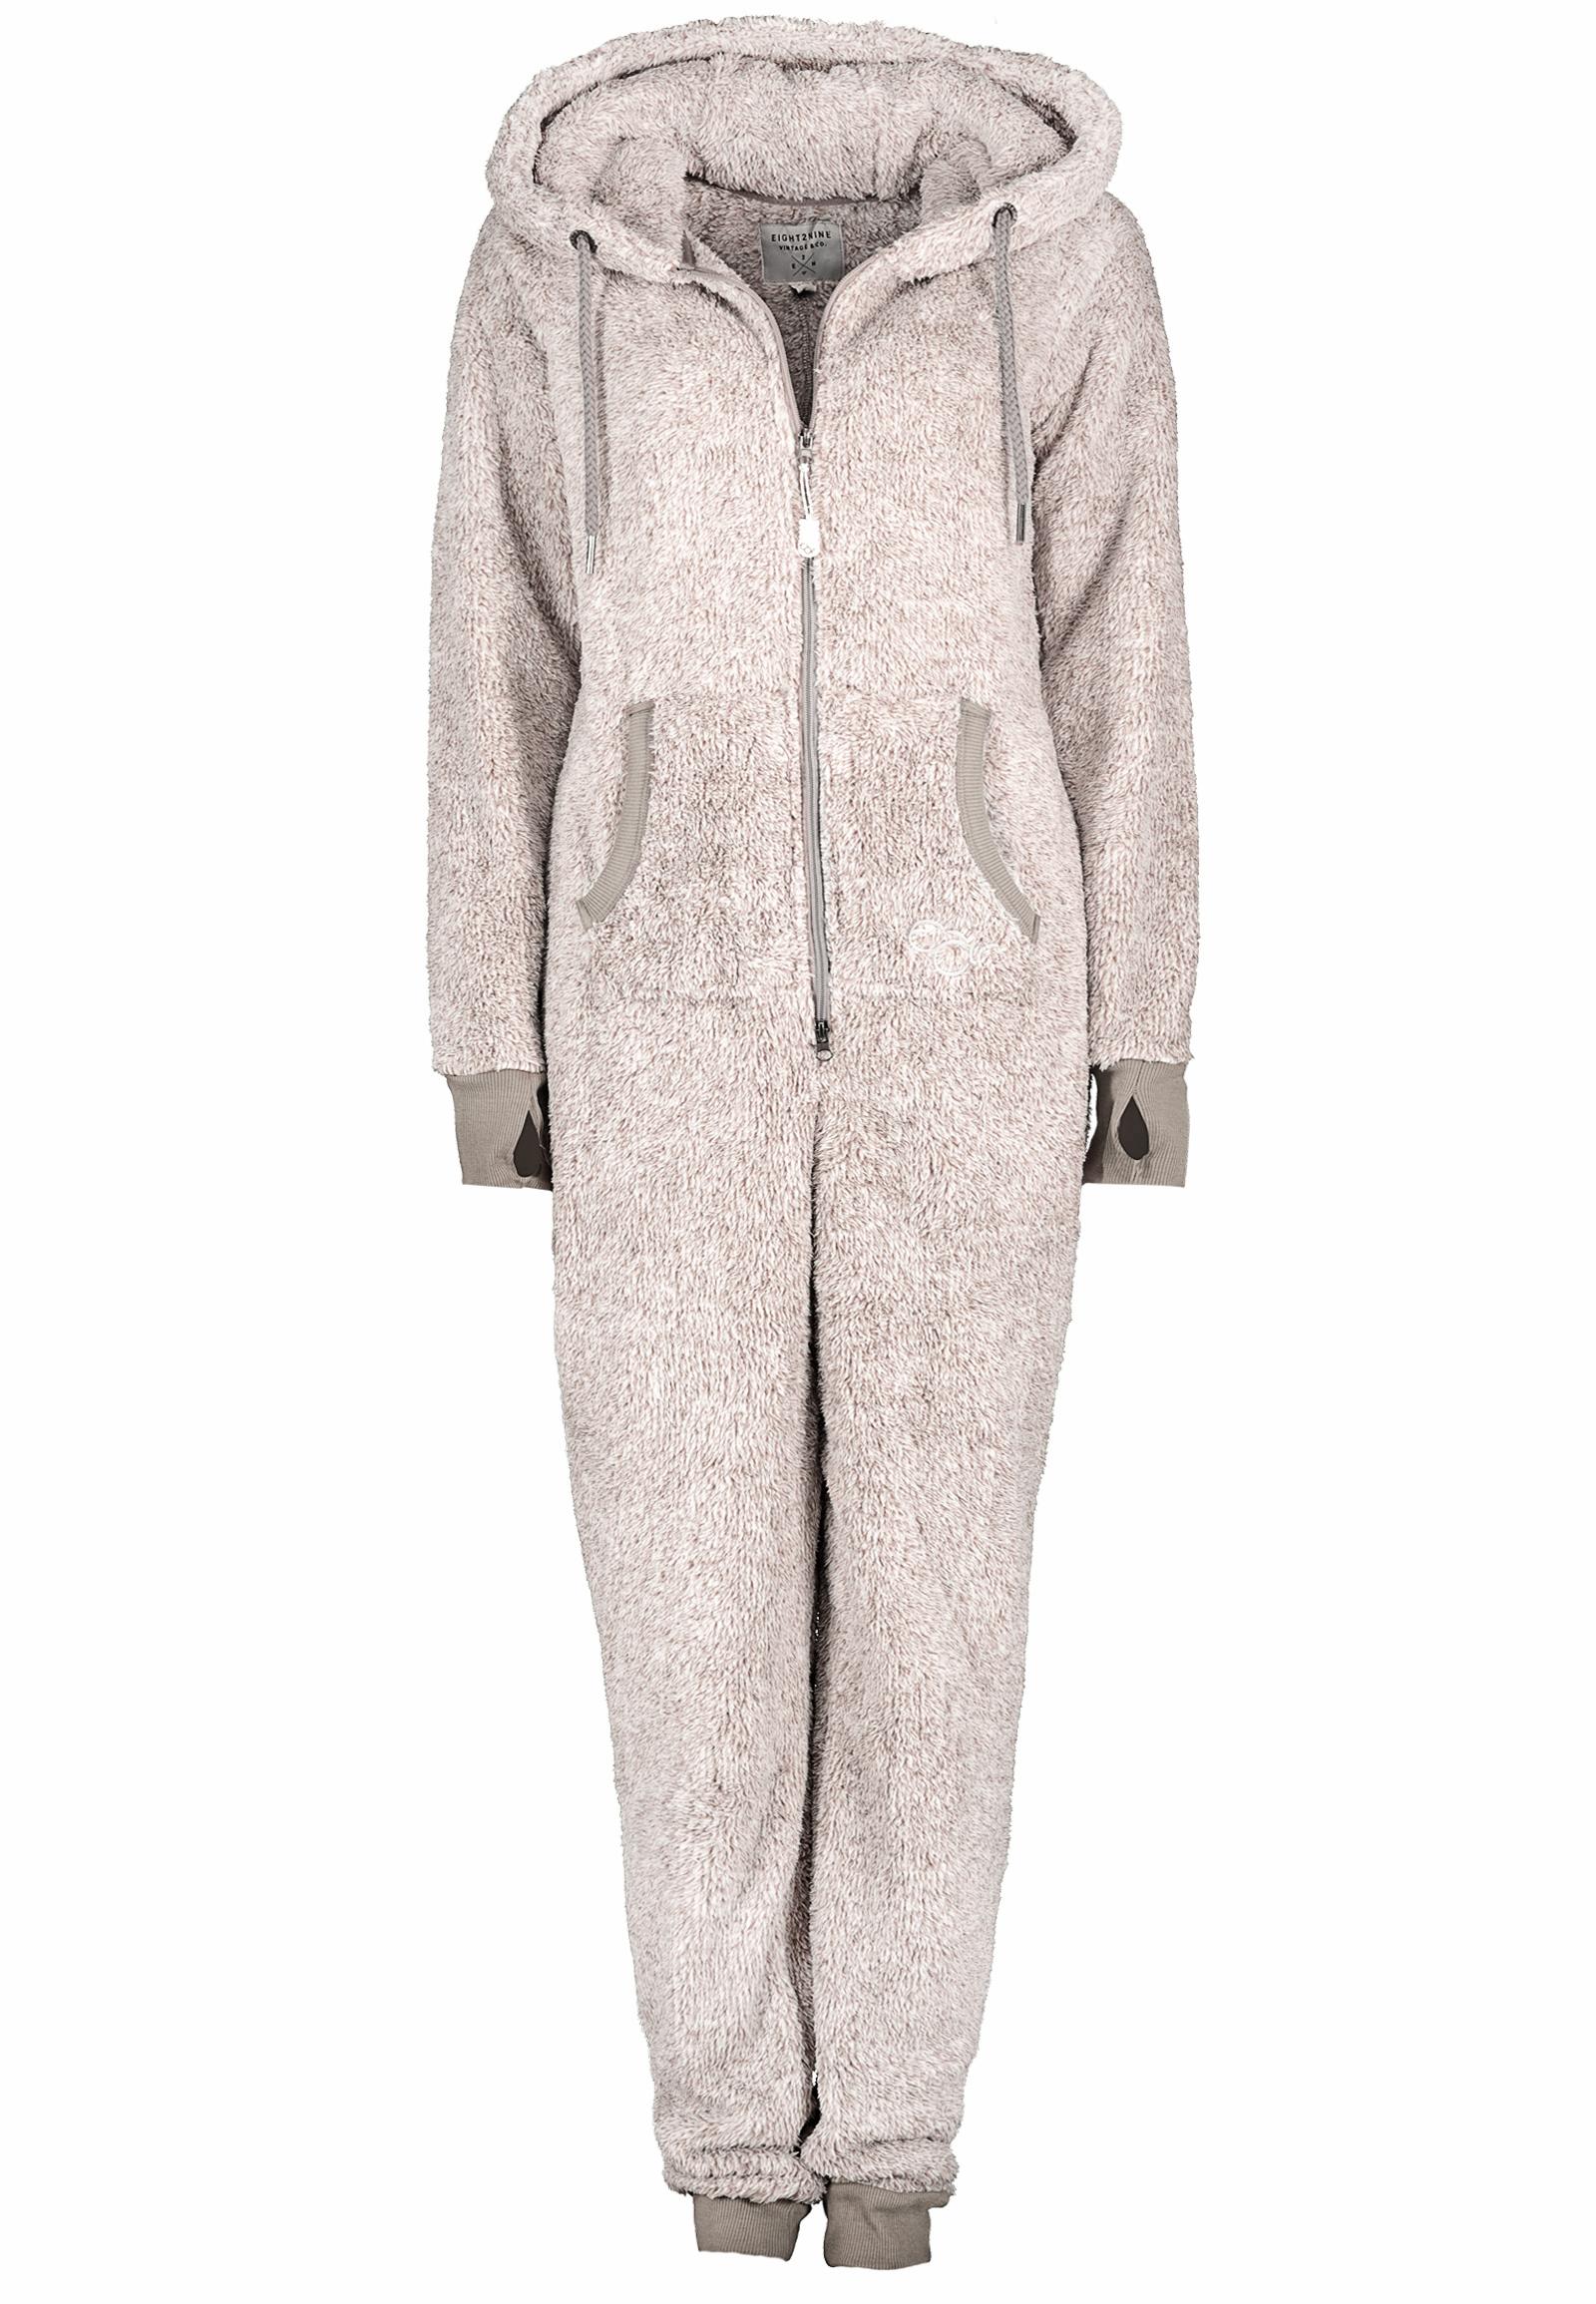 jumpsuit teddy fleece overall ganzk rperanzug ohren damen eight2nine ebay. Black Bedroom Furniture Sets. Home Design Ideas